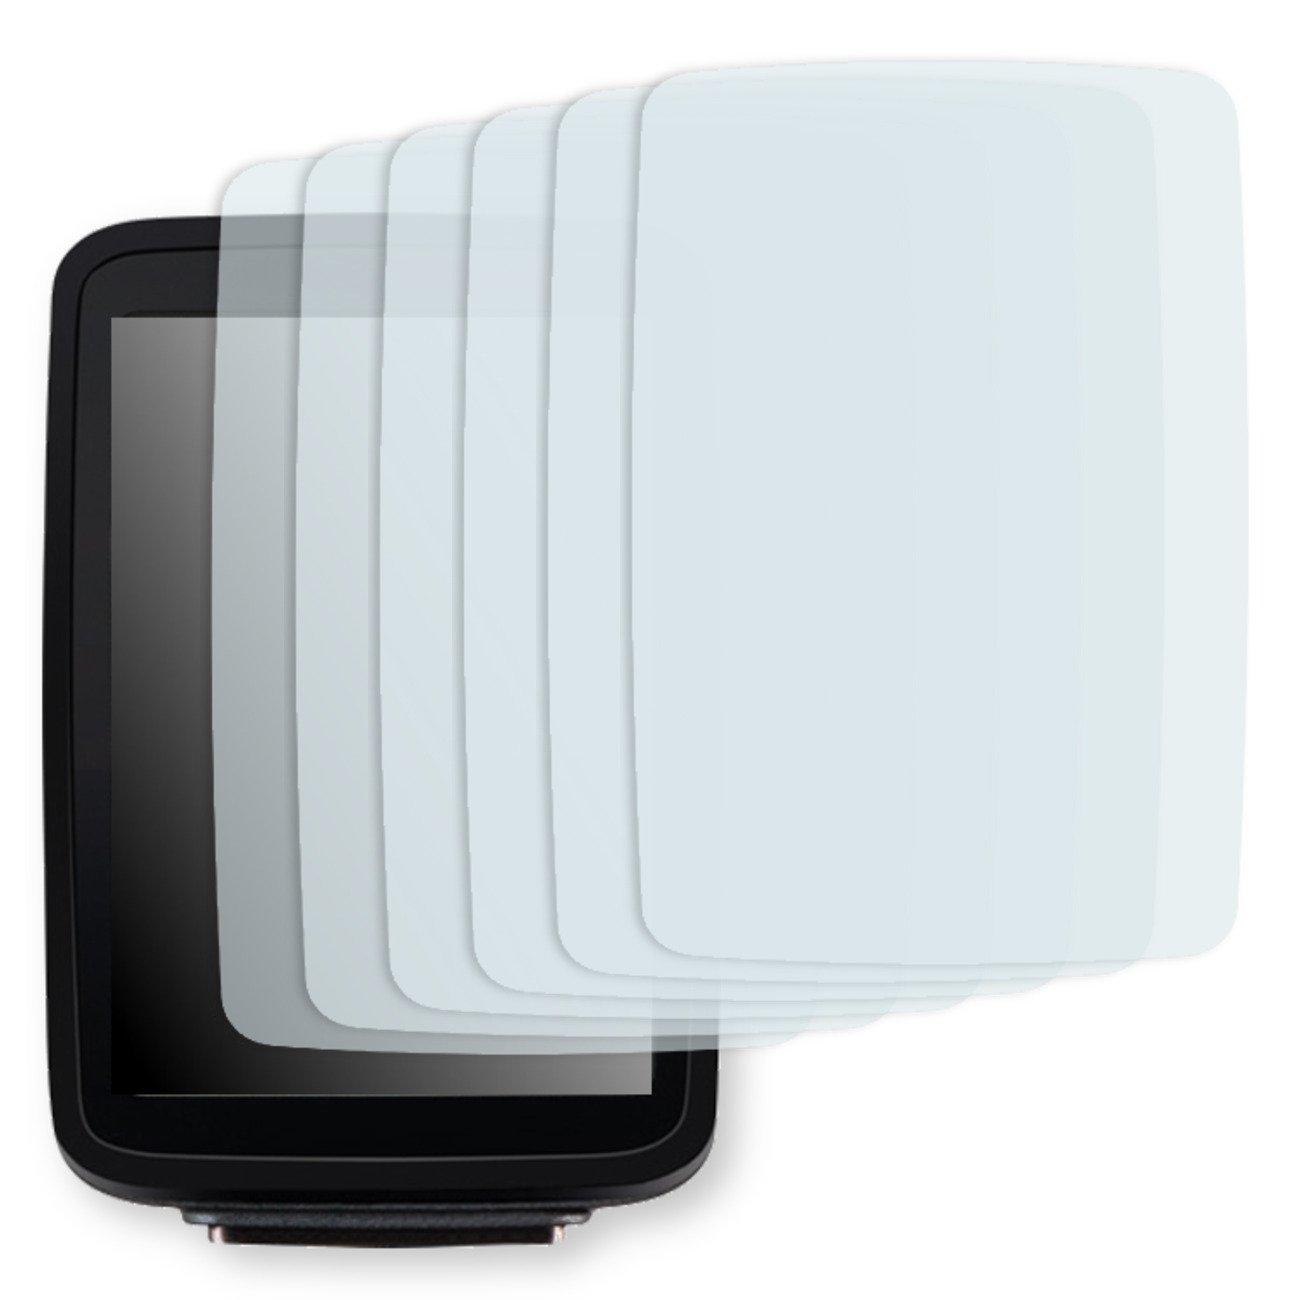 GOLEBO 6 x Protectores Pantalla Sigma Pure 1. Lámina Protectora Adhesiva Invisible Crystal Clear. Fabricado en Alemania. DISAGU .#xc7719_6.